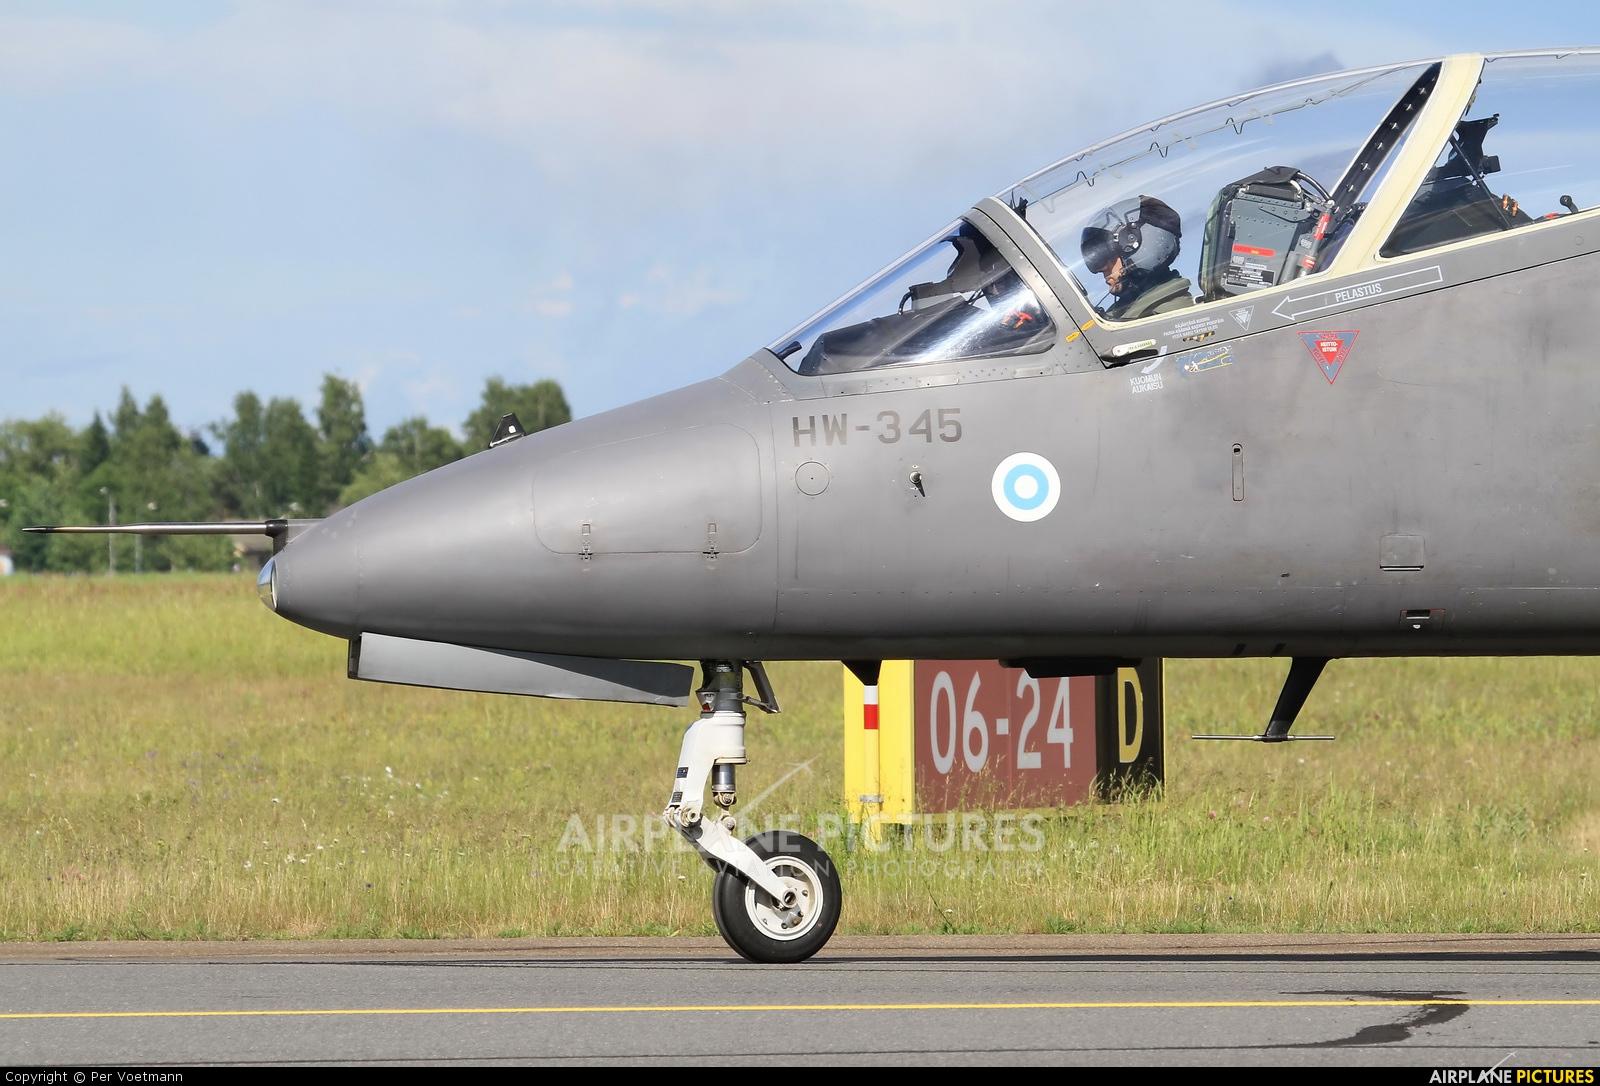 Finland - Air Force: Midnight Hawks HW-345 aircraft at Lappeenranta